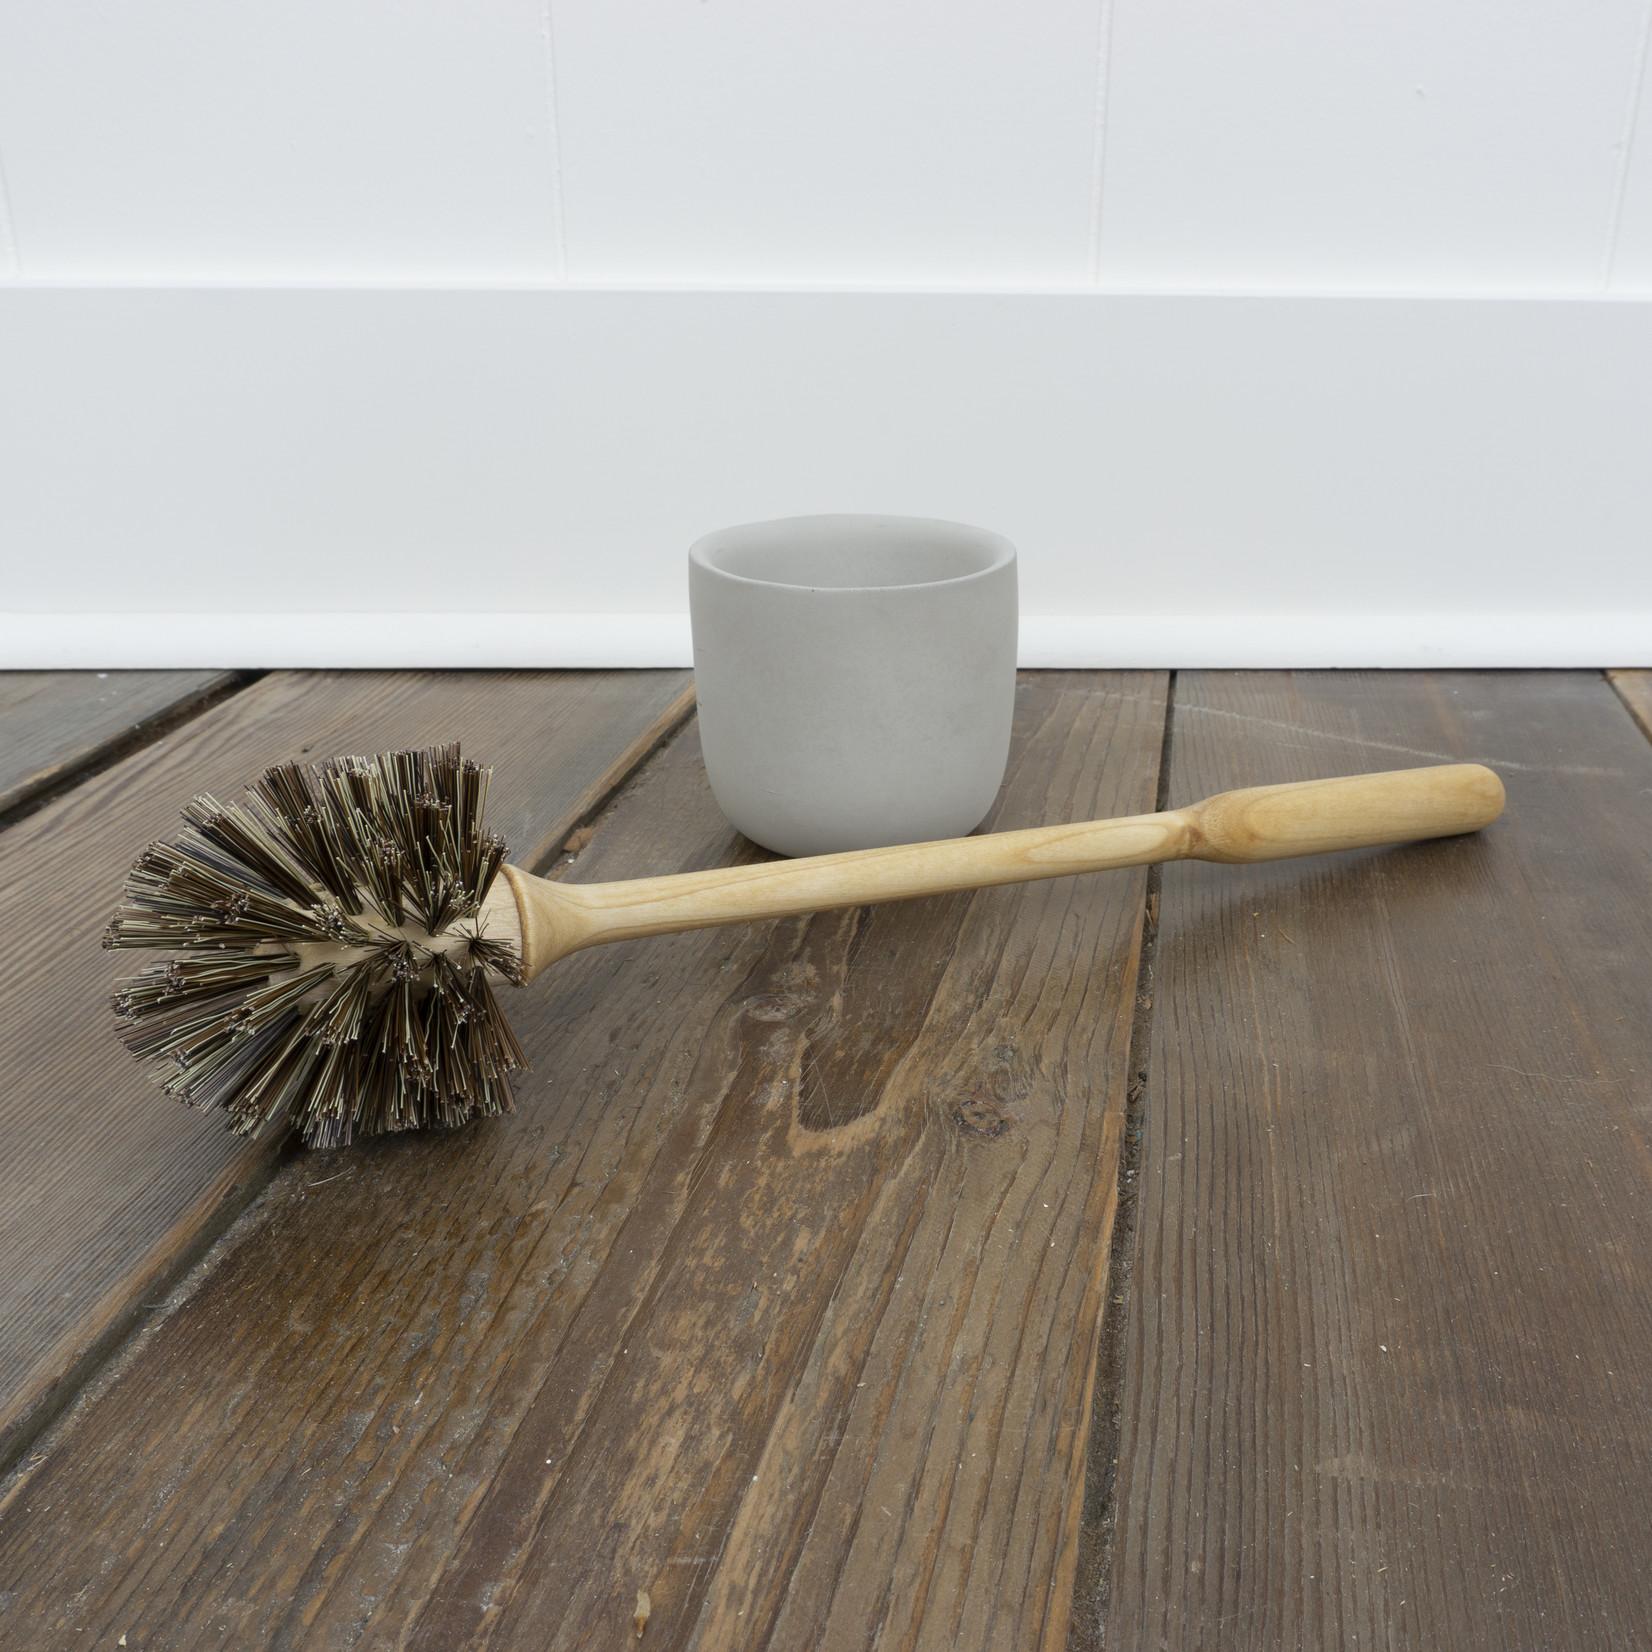 Birch Toilet Brush with Concrete Holder